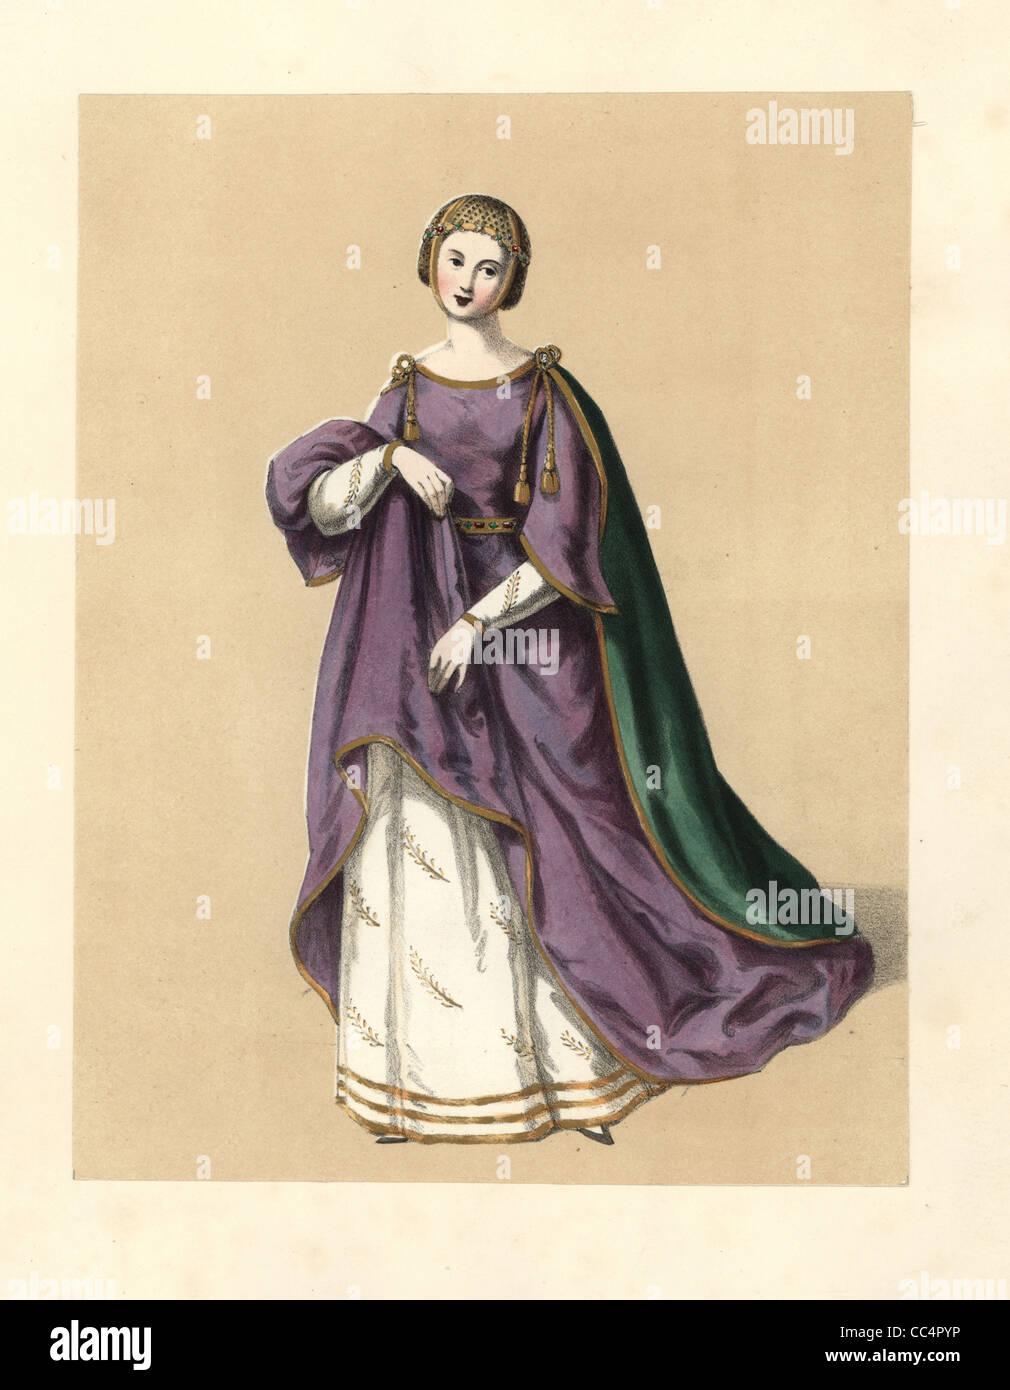 Dress of the reign of King Edward I, Longshanks. - Stock Image